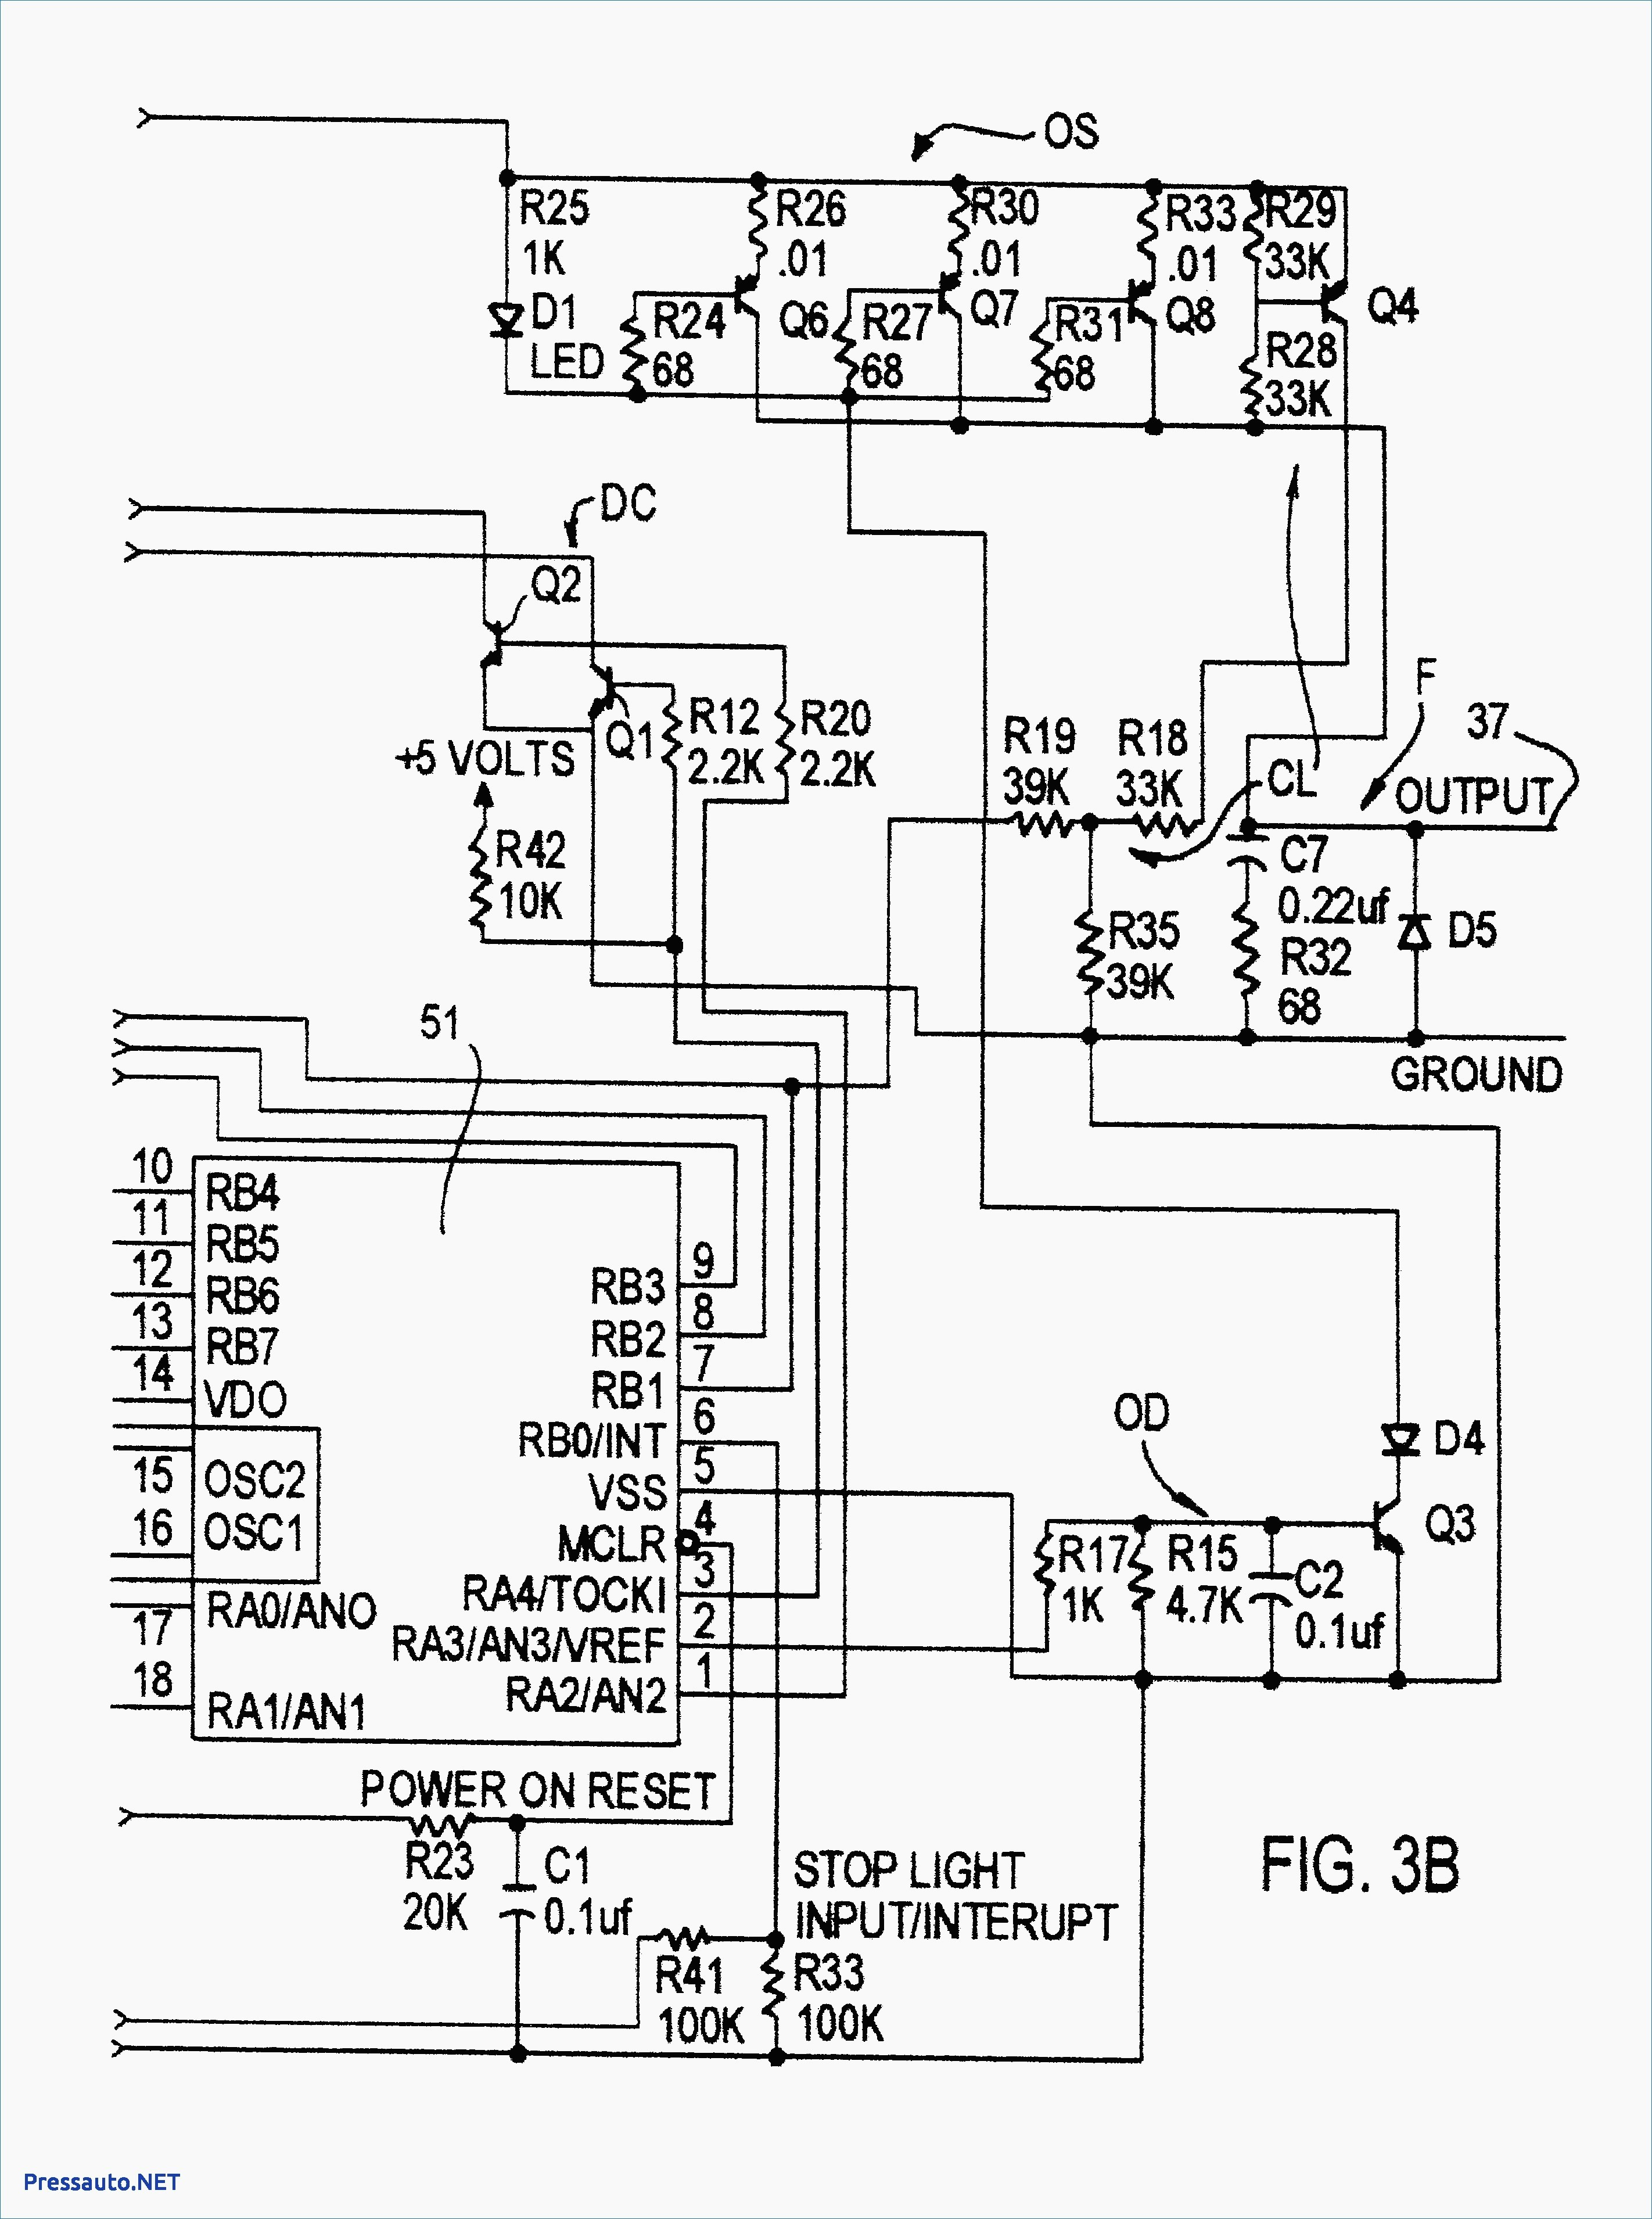 Trailer Breakaway Wiring Diagram Wiring Diagram Electric Trailer Brake Control Pressauto Net at Of Trailer Breakaway Wiring Diagram